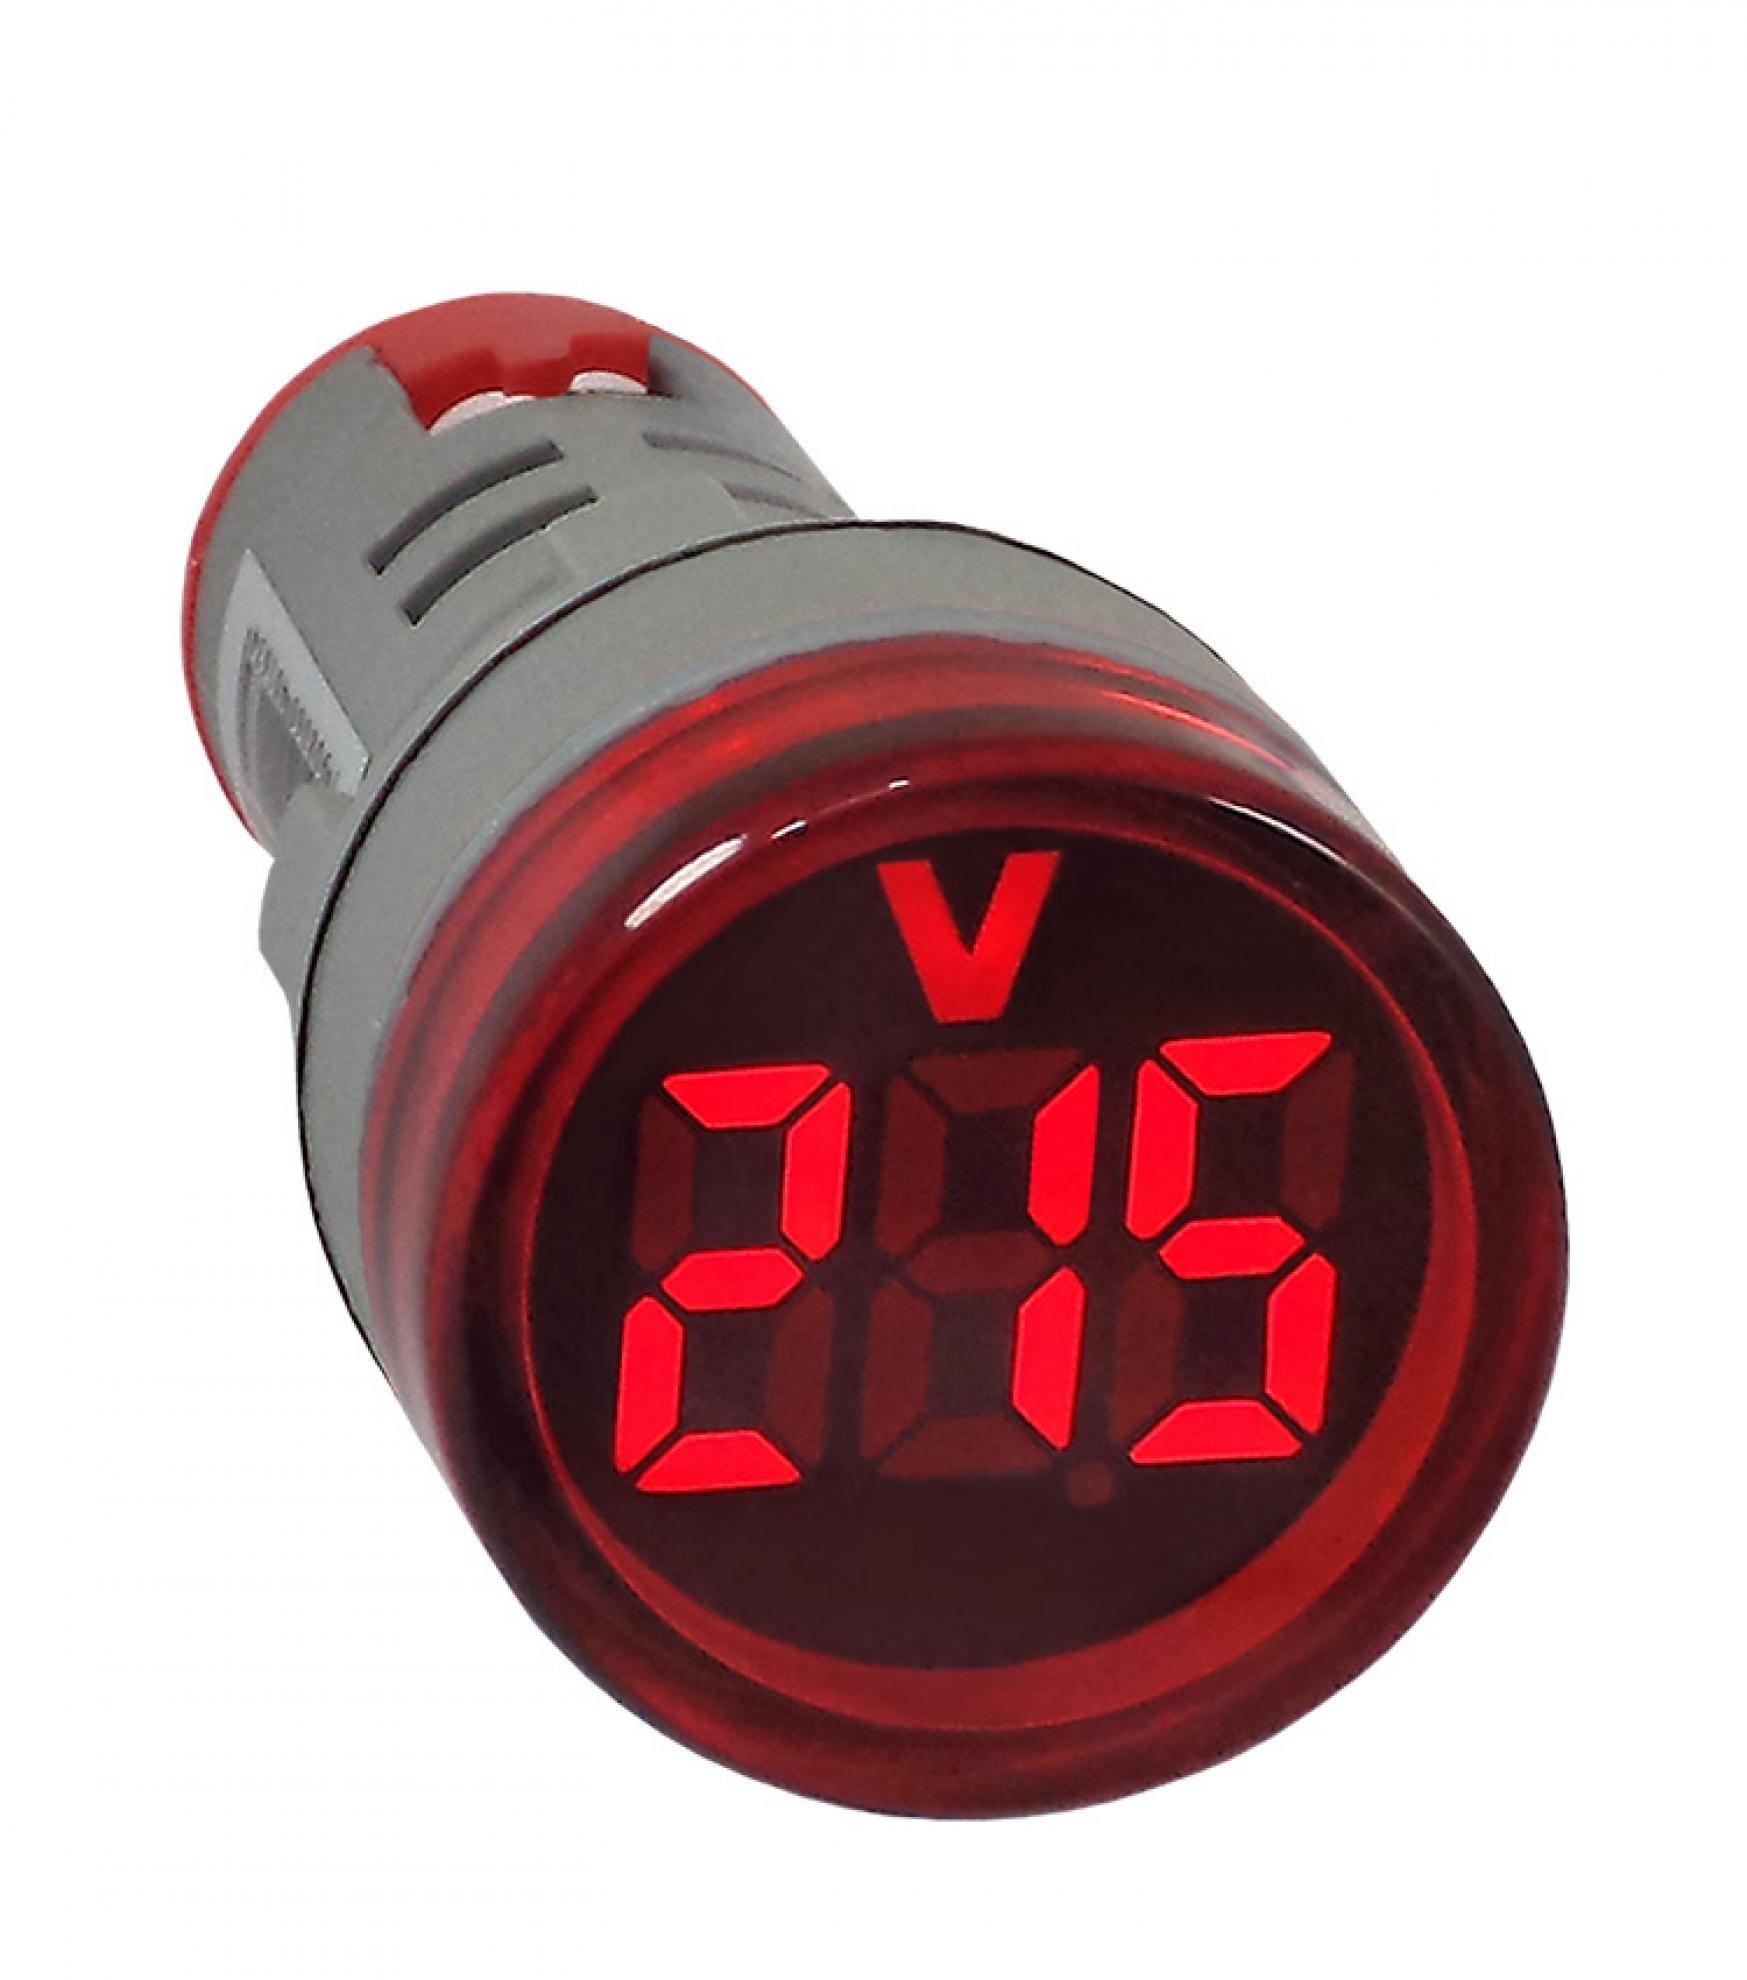 Volt�metro Digital 22mm Vermelho de 20-500Vca - AD22-22VS-R